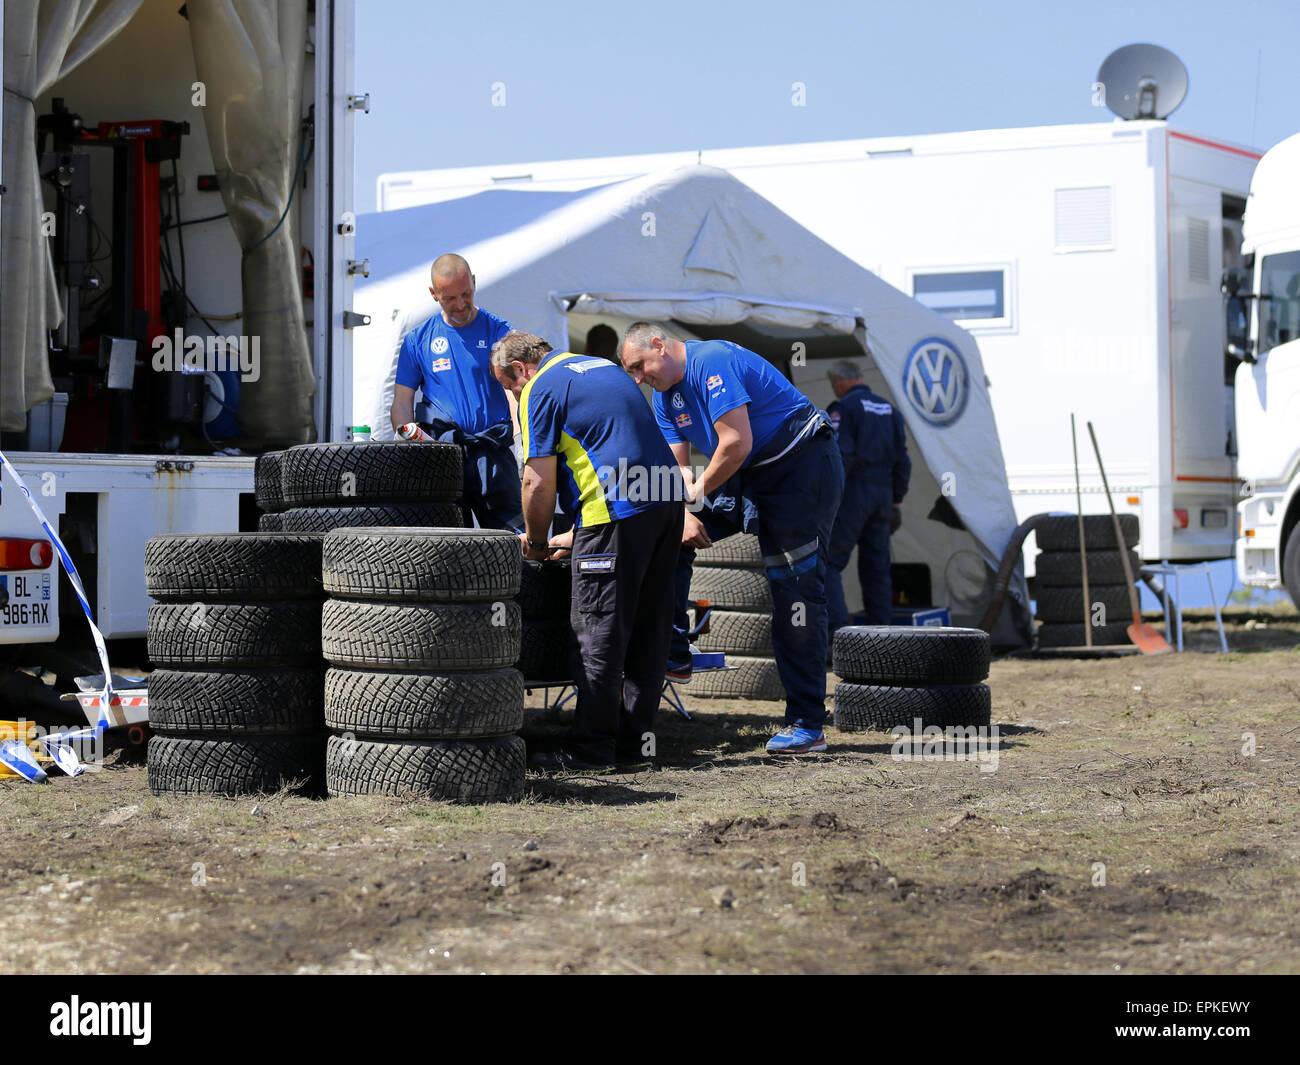 VIANA DO CASTELO, PORTUGAL - Mai 12: Volkswagen Polo R WRC in der Prüfung für Rallye Portugal in Viana Stockbild